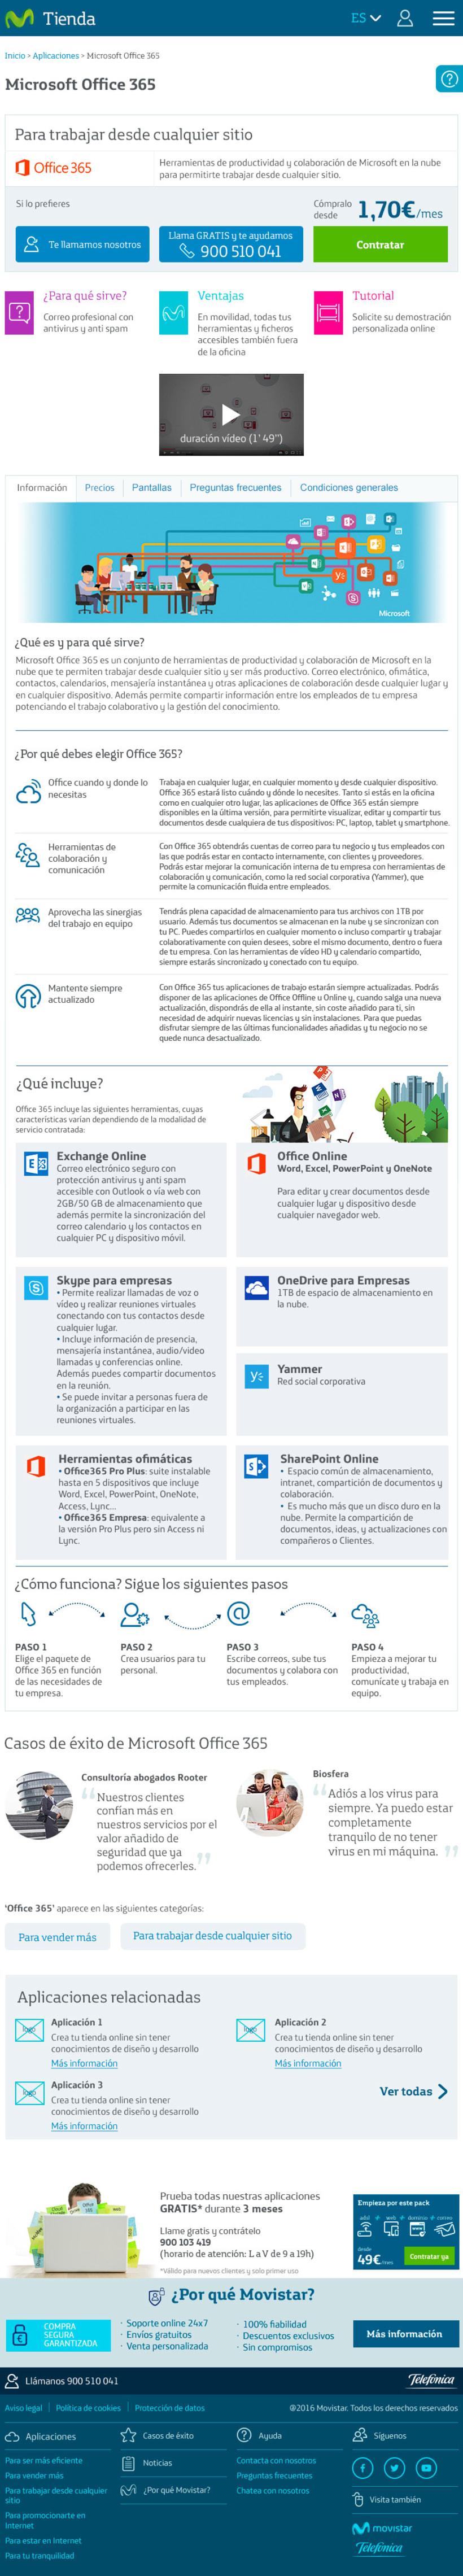 Marketplace servicios cloud 19